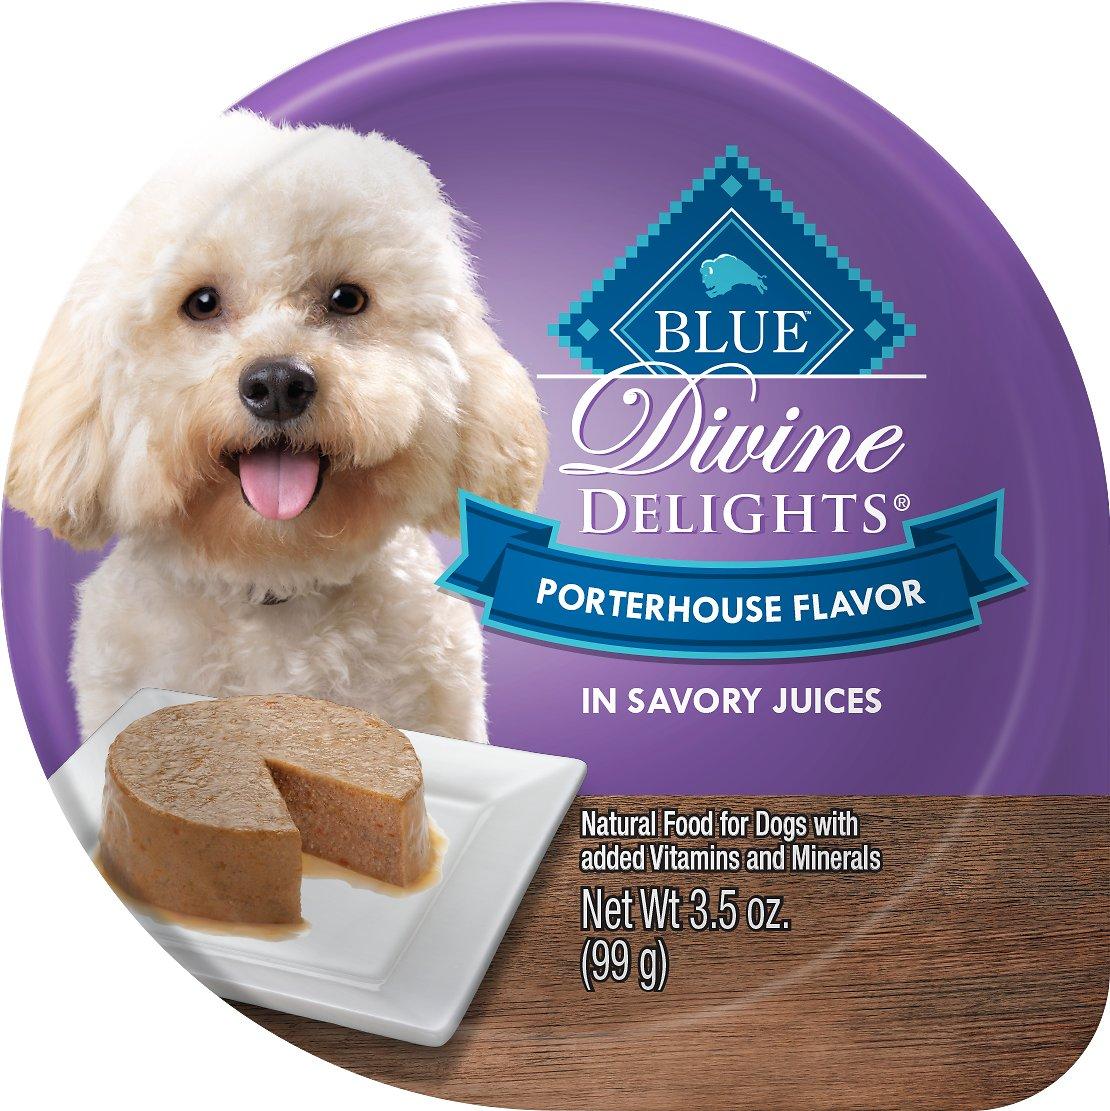 Blue Buffalo Divine Delights Porterhouse Flavor Pate Dog Food Trays, 3.5-oz, case of 12